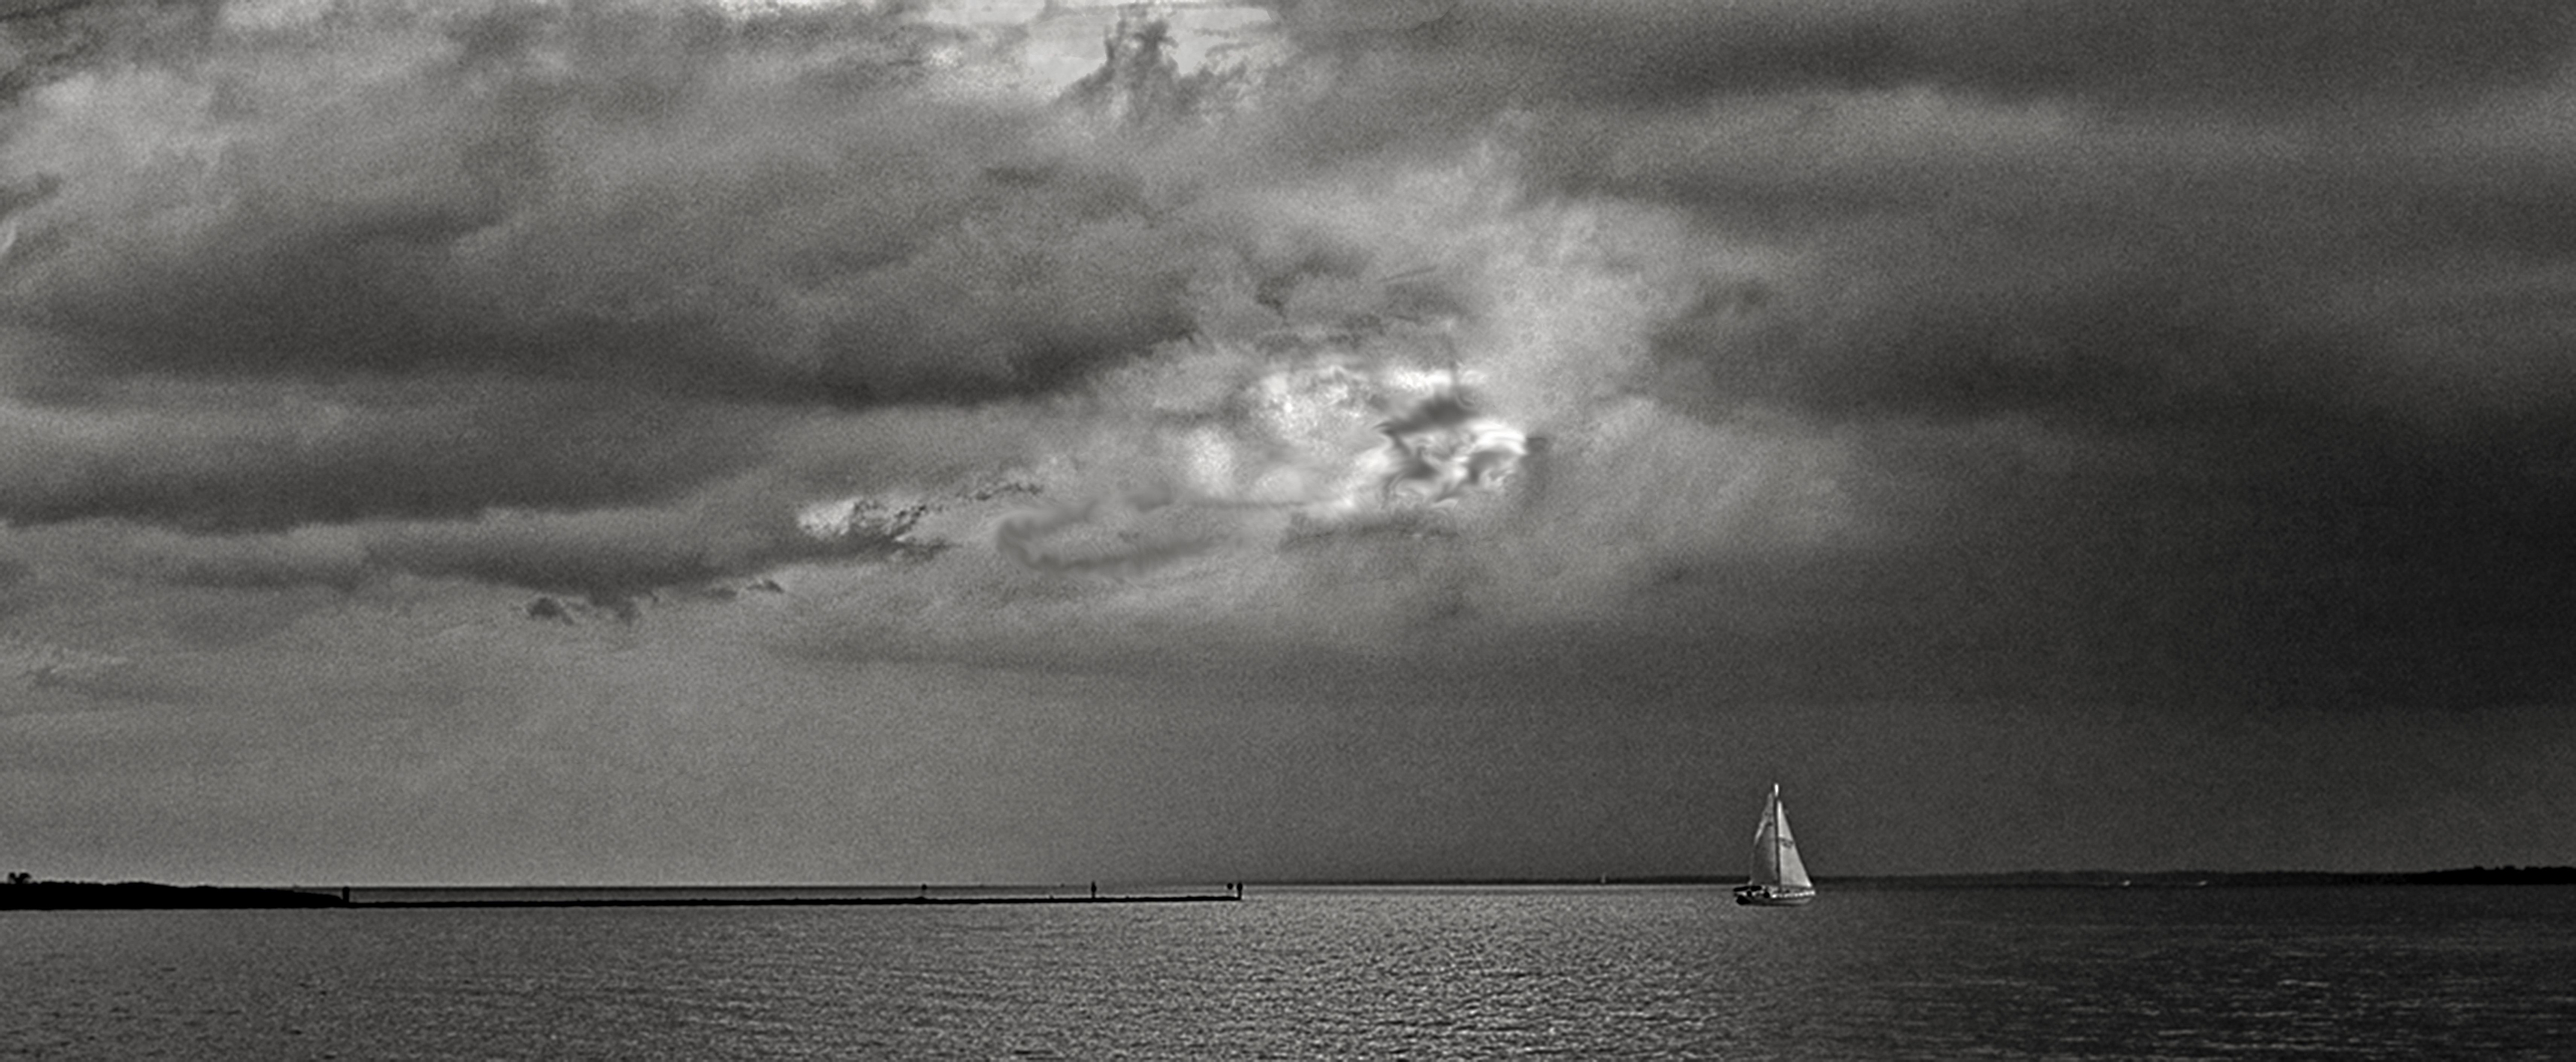 Storm Clouds 005-100